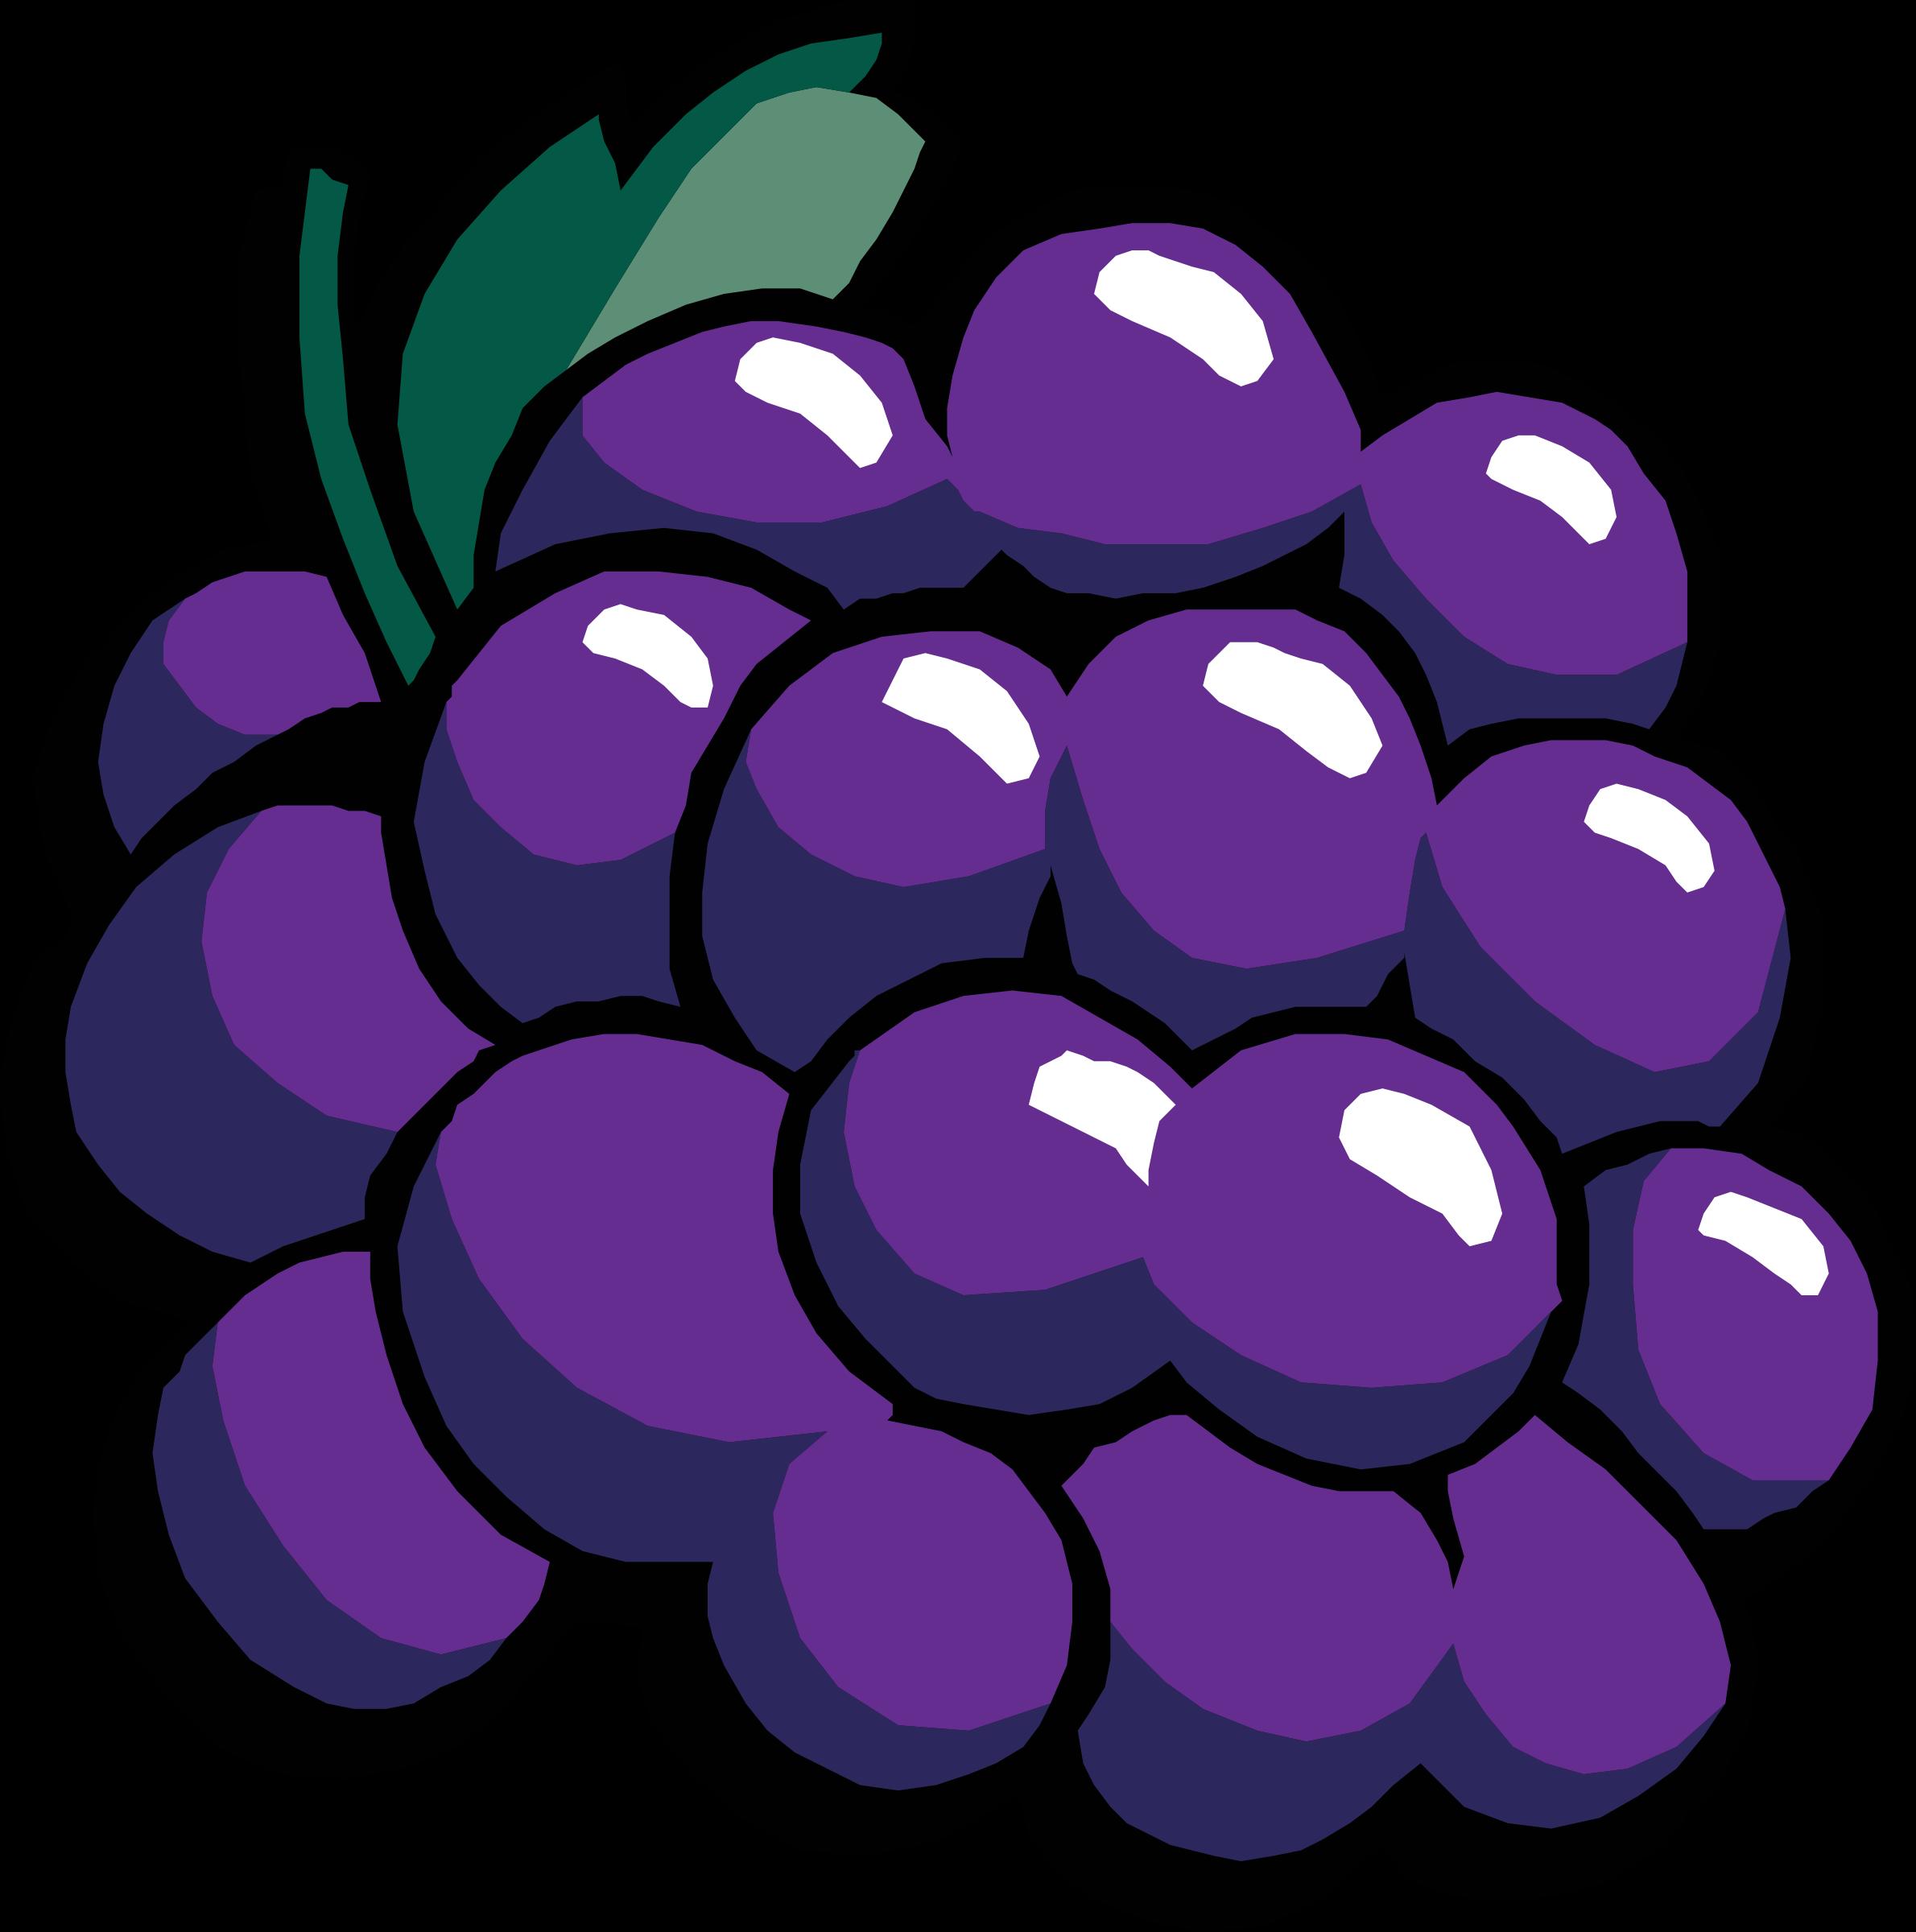 Grape clipart illustration. Grapes big image png